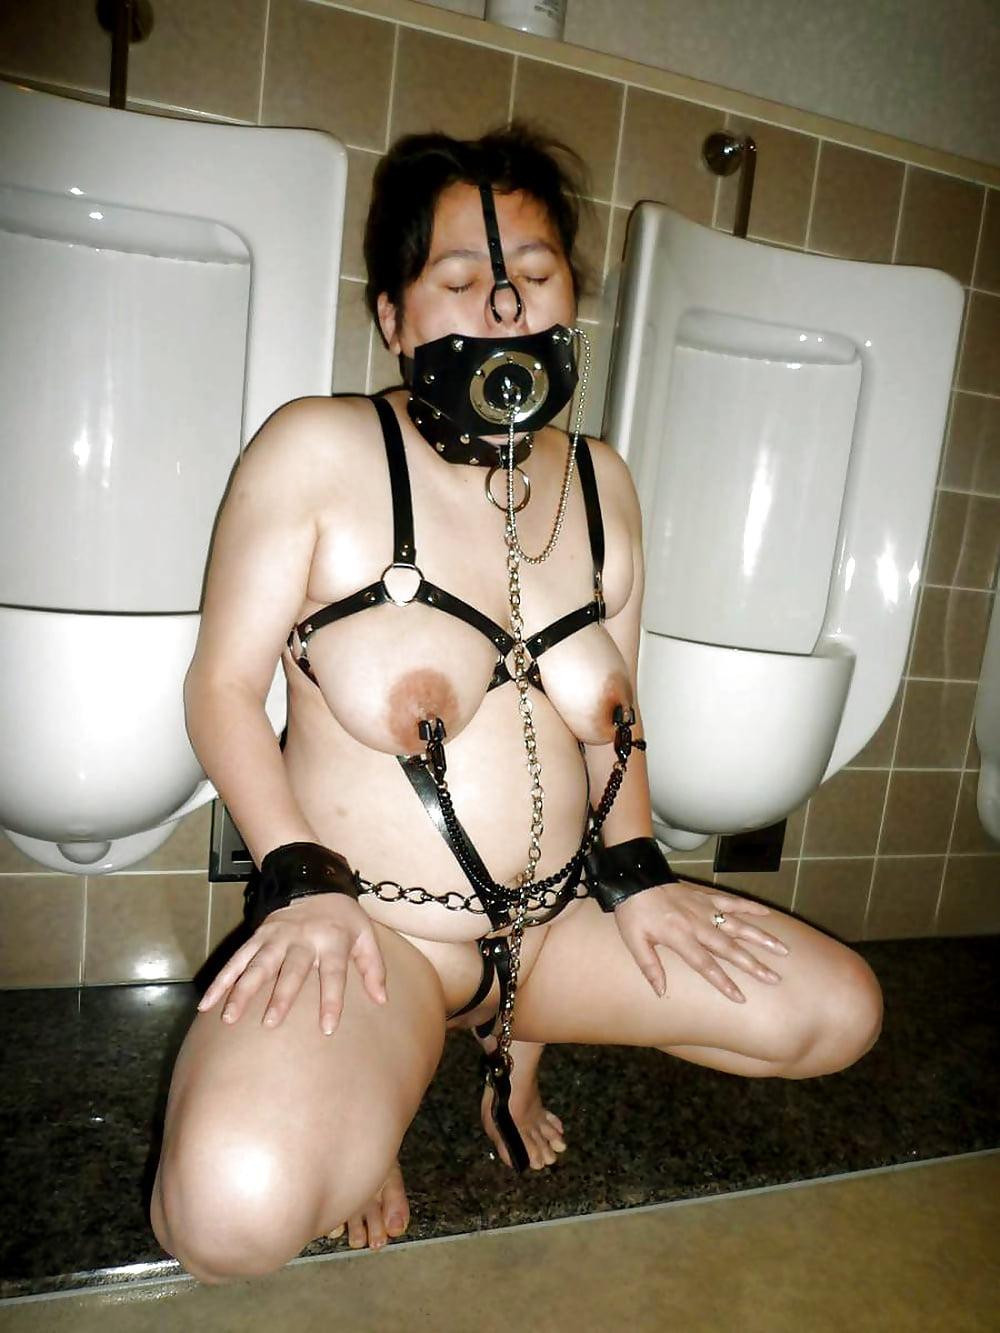 bdsm-toilet-squirtingtures-girls-cunt-cum